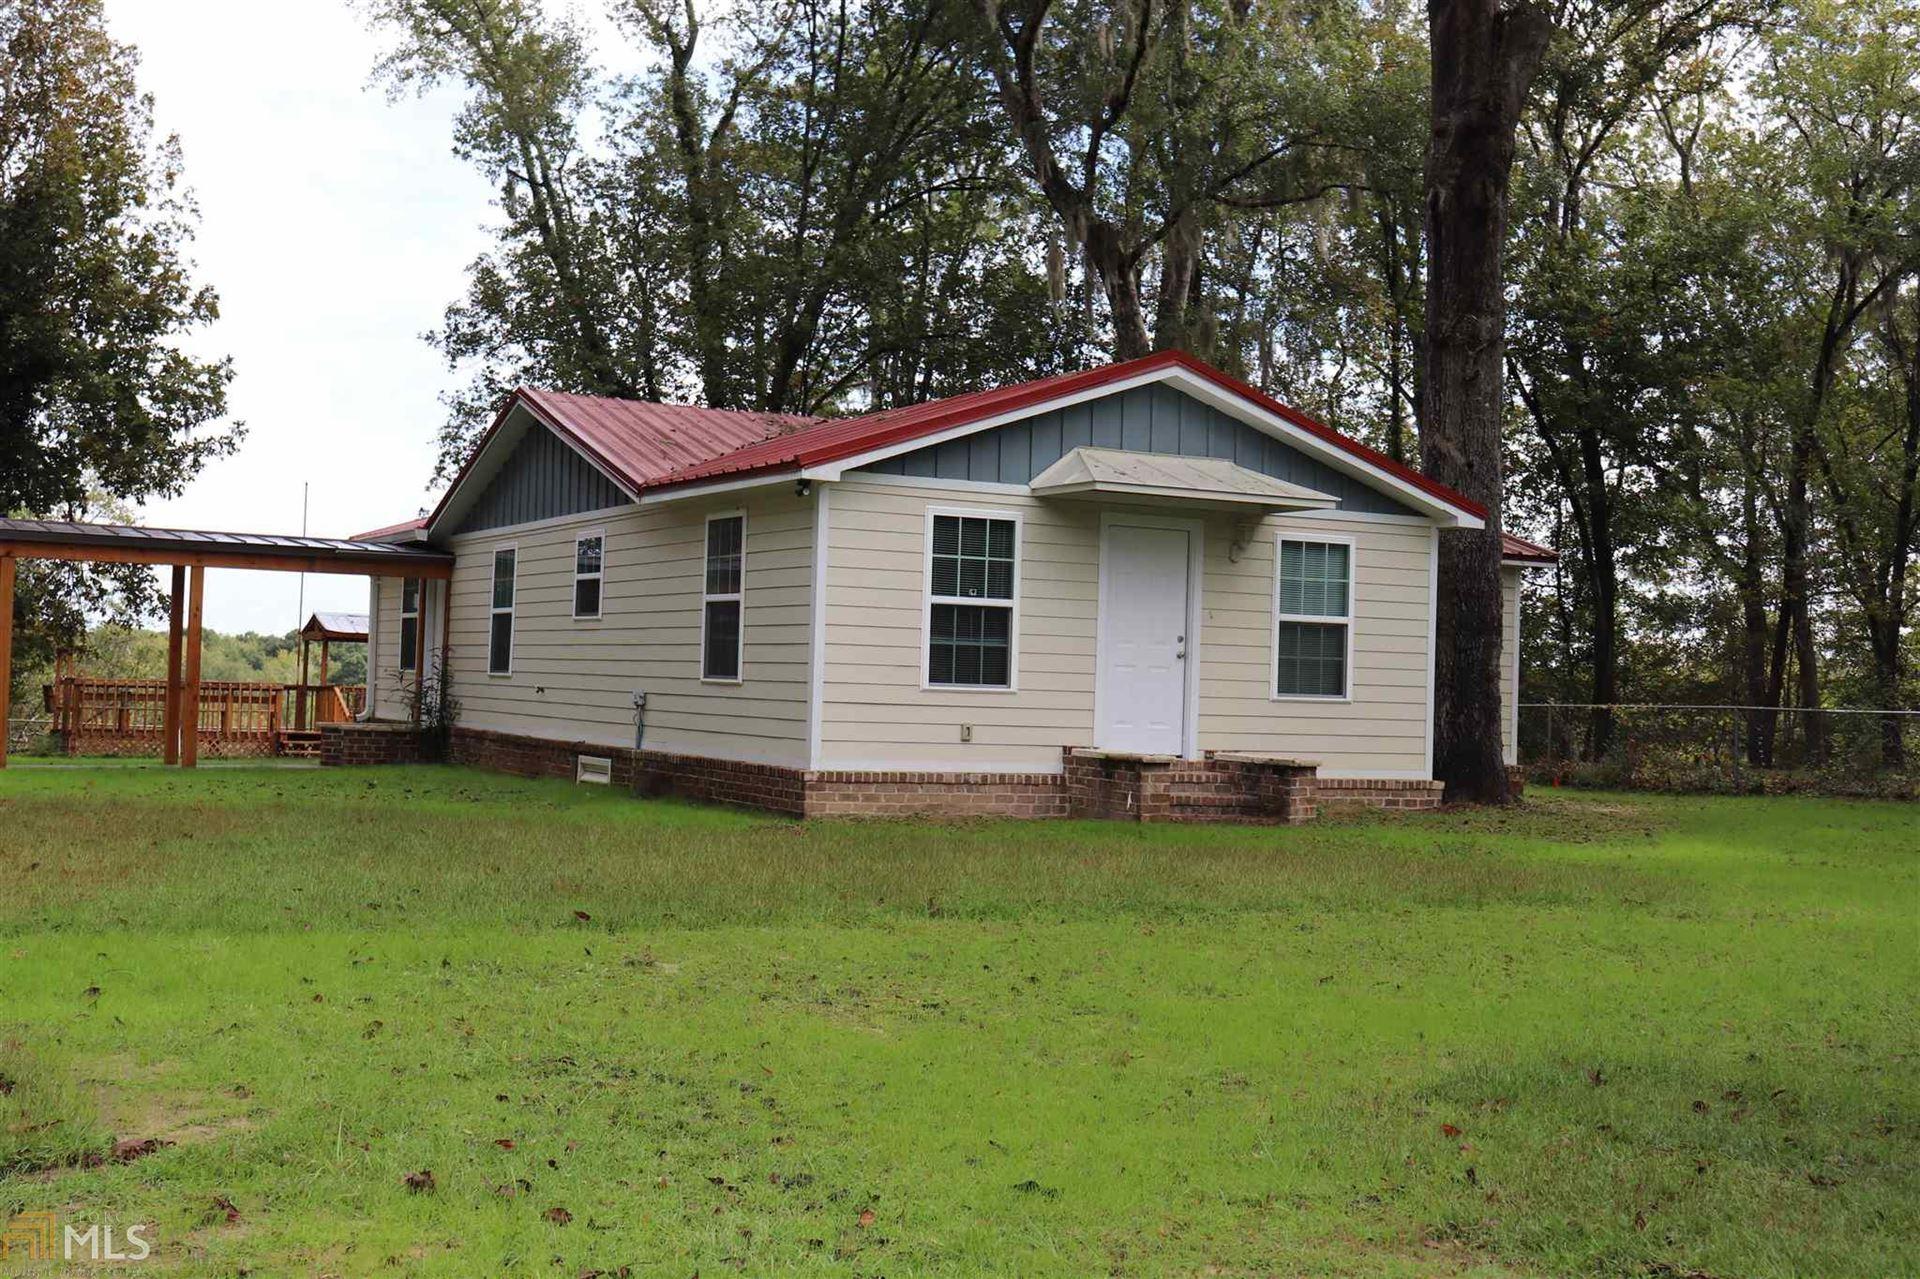 344 Tuckasee King Rd, Clyo, GA 31303 - MLS#: 8852318